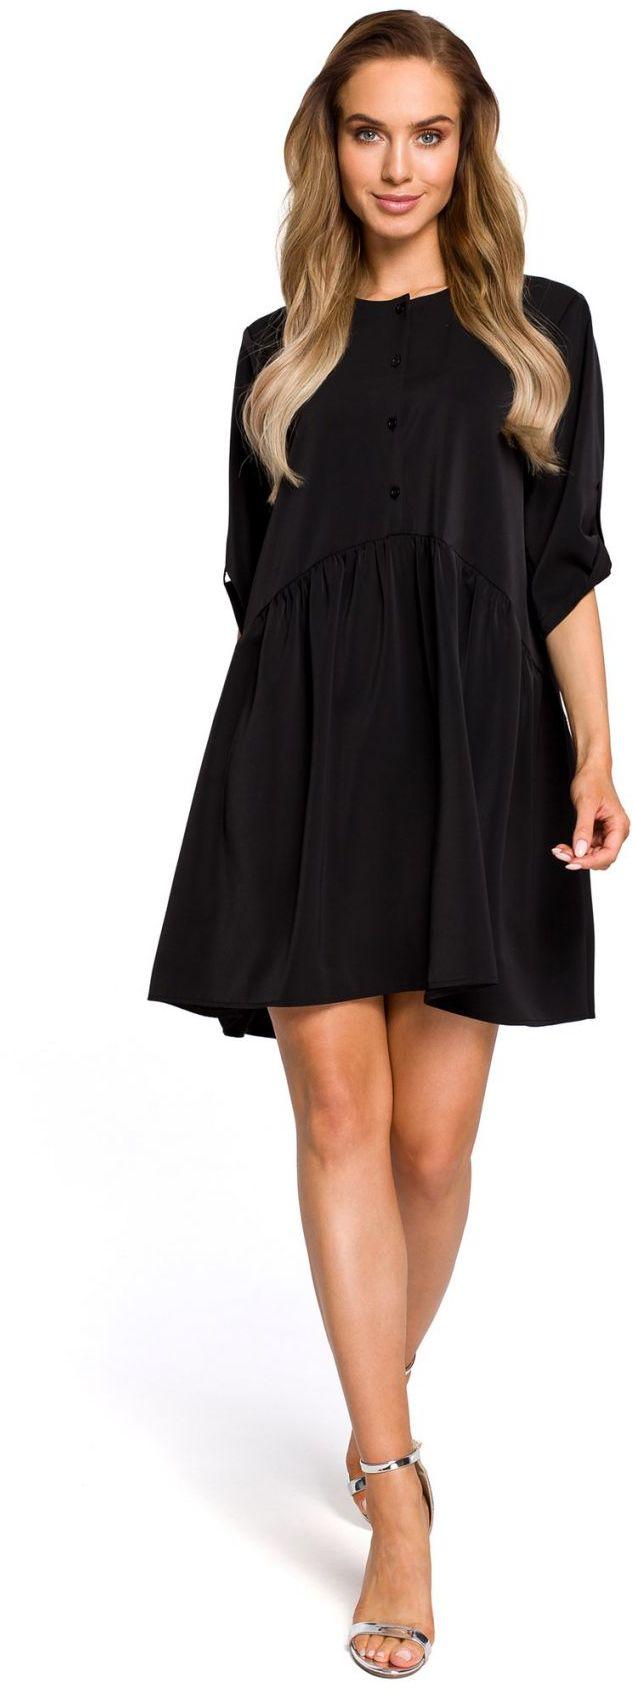 M427 Luźna sukienka marszczona w pasie - czarna